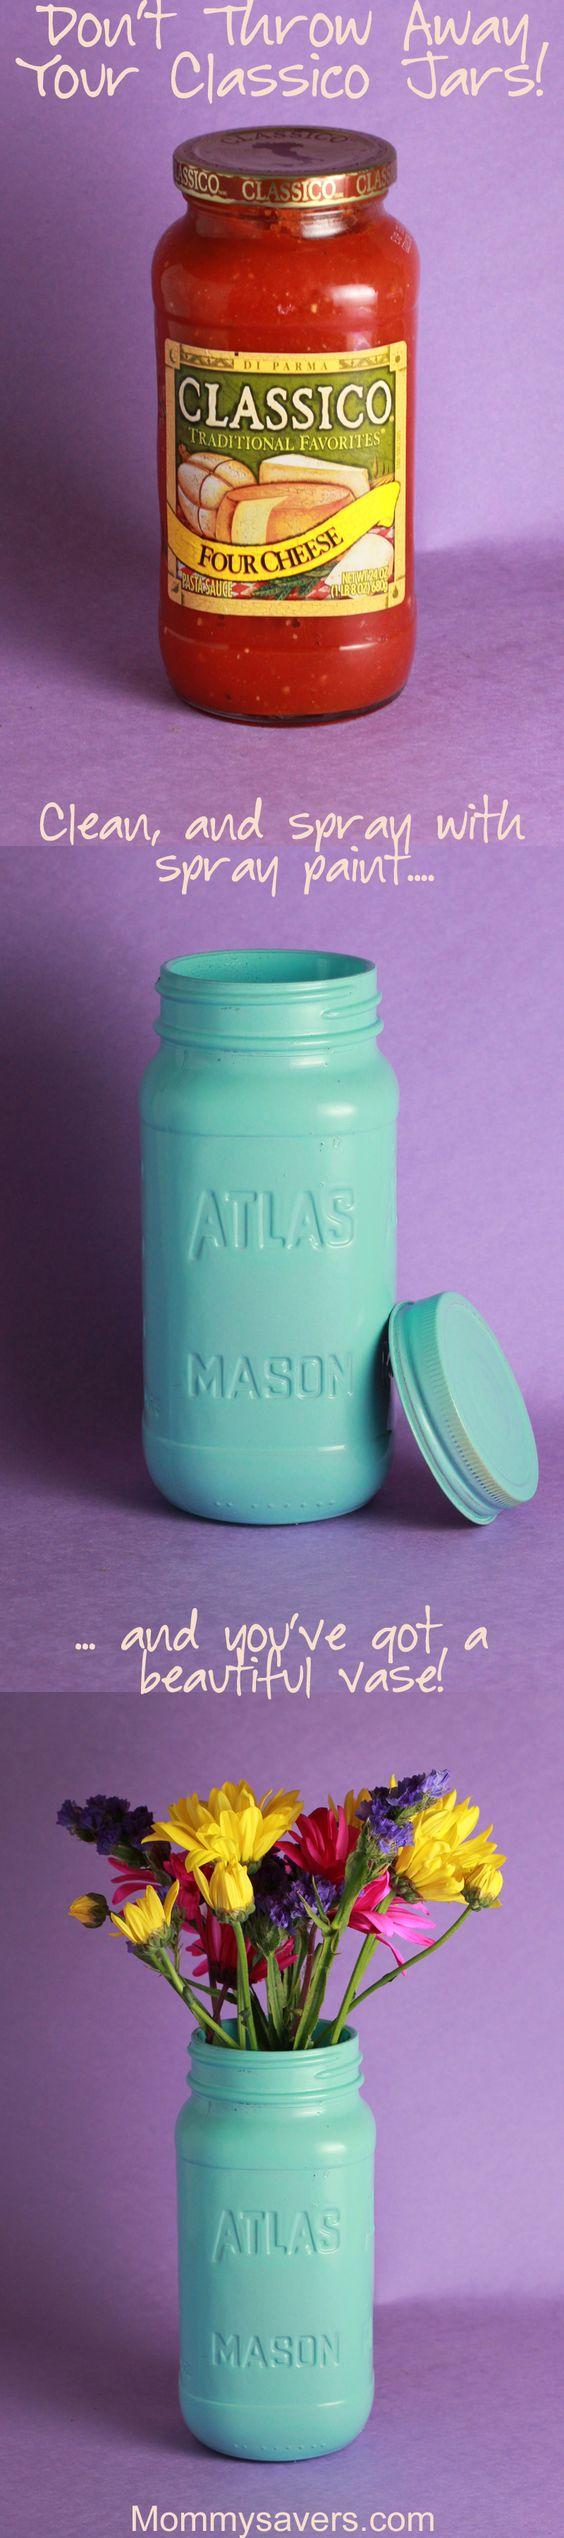 Don't throw your Classico Pasta Sauce jars away! (Actually, never throw them away - Recycle!)